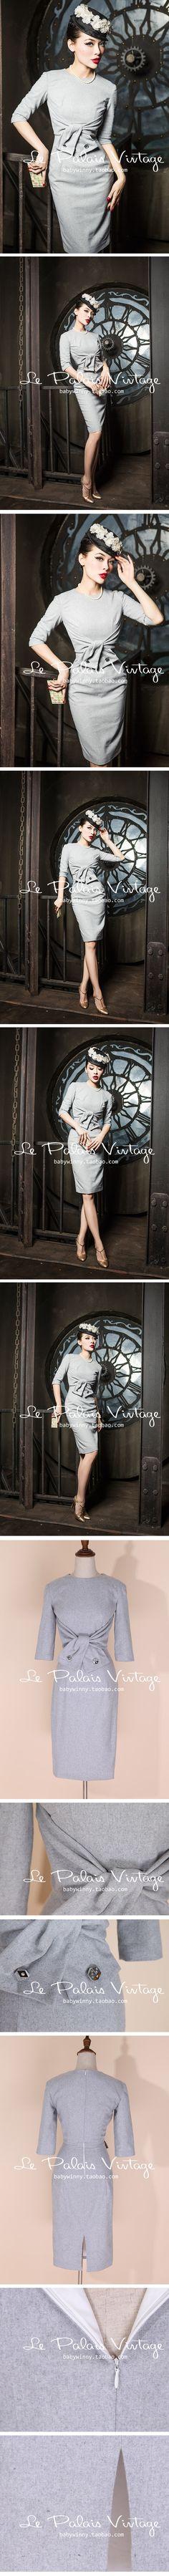 le palais vintage限量 优雅浅灰蝴蝶结腰封修身毛呢连衣裙【0.4-淘宝网 Retro Mode, Mode Vintage, Vintage Girls, 1940s Fashion, Vintage Fashion, Retro Outfits, Vintage Outfits, La Palais Vintage, Idda Van Munster